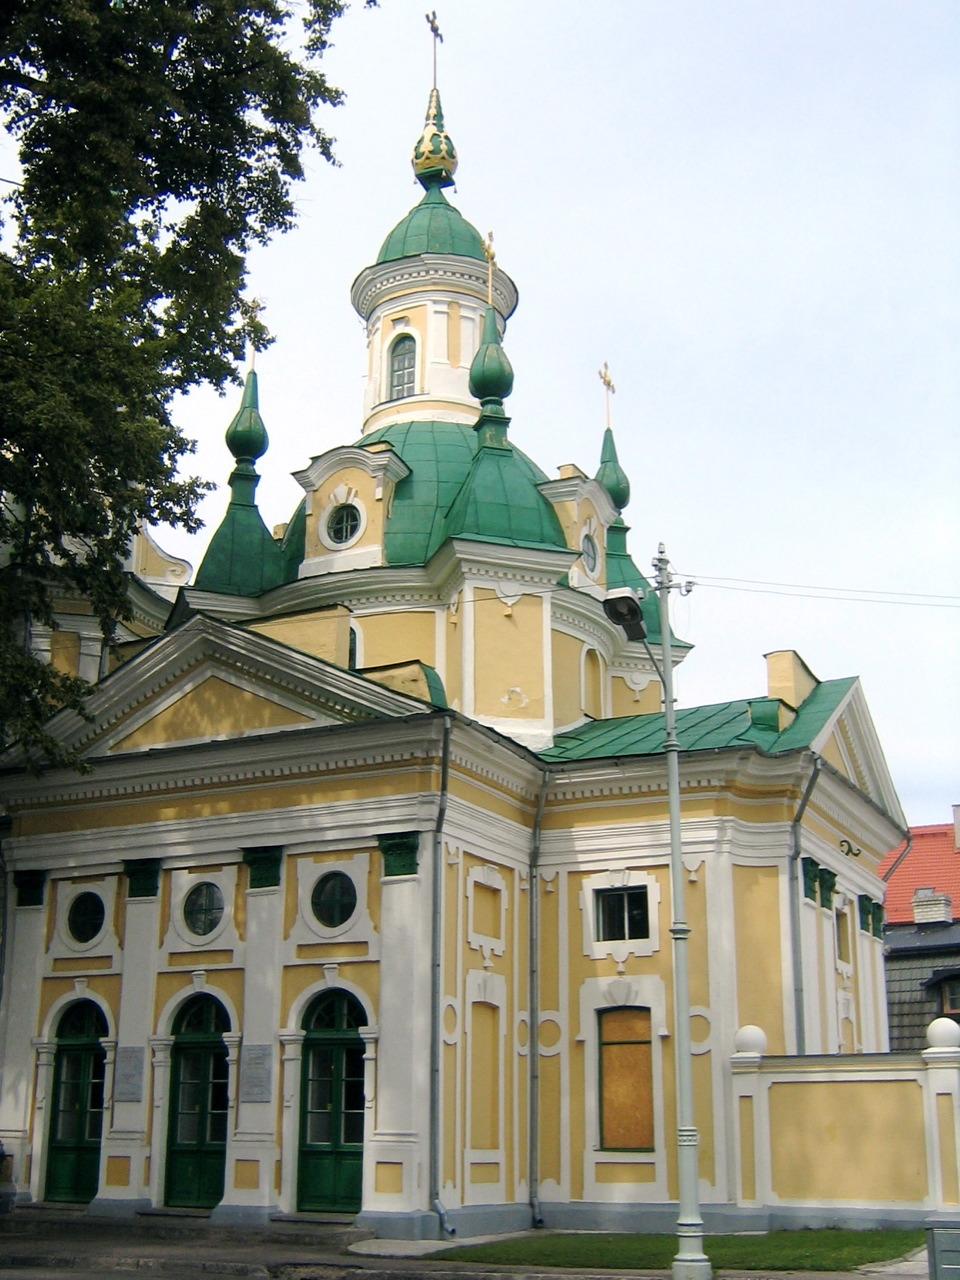 Helsinki Pärnu